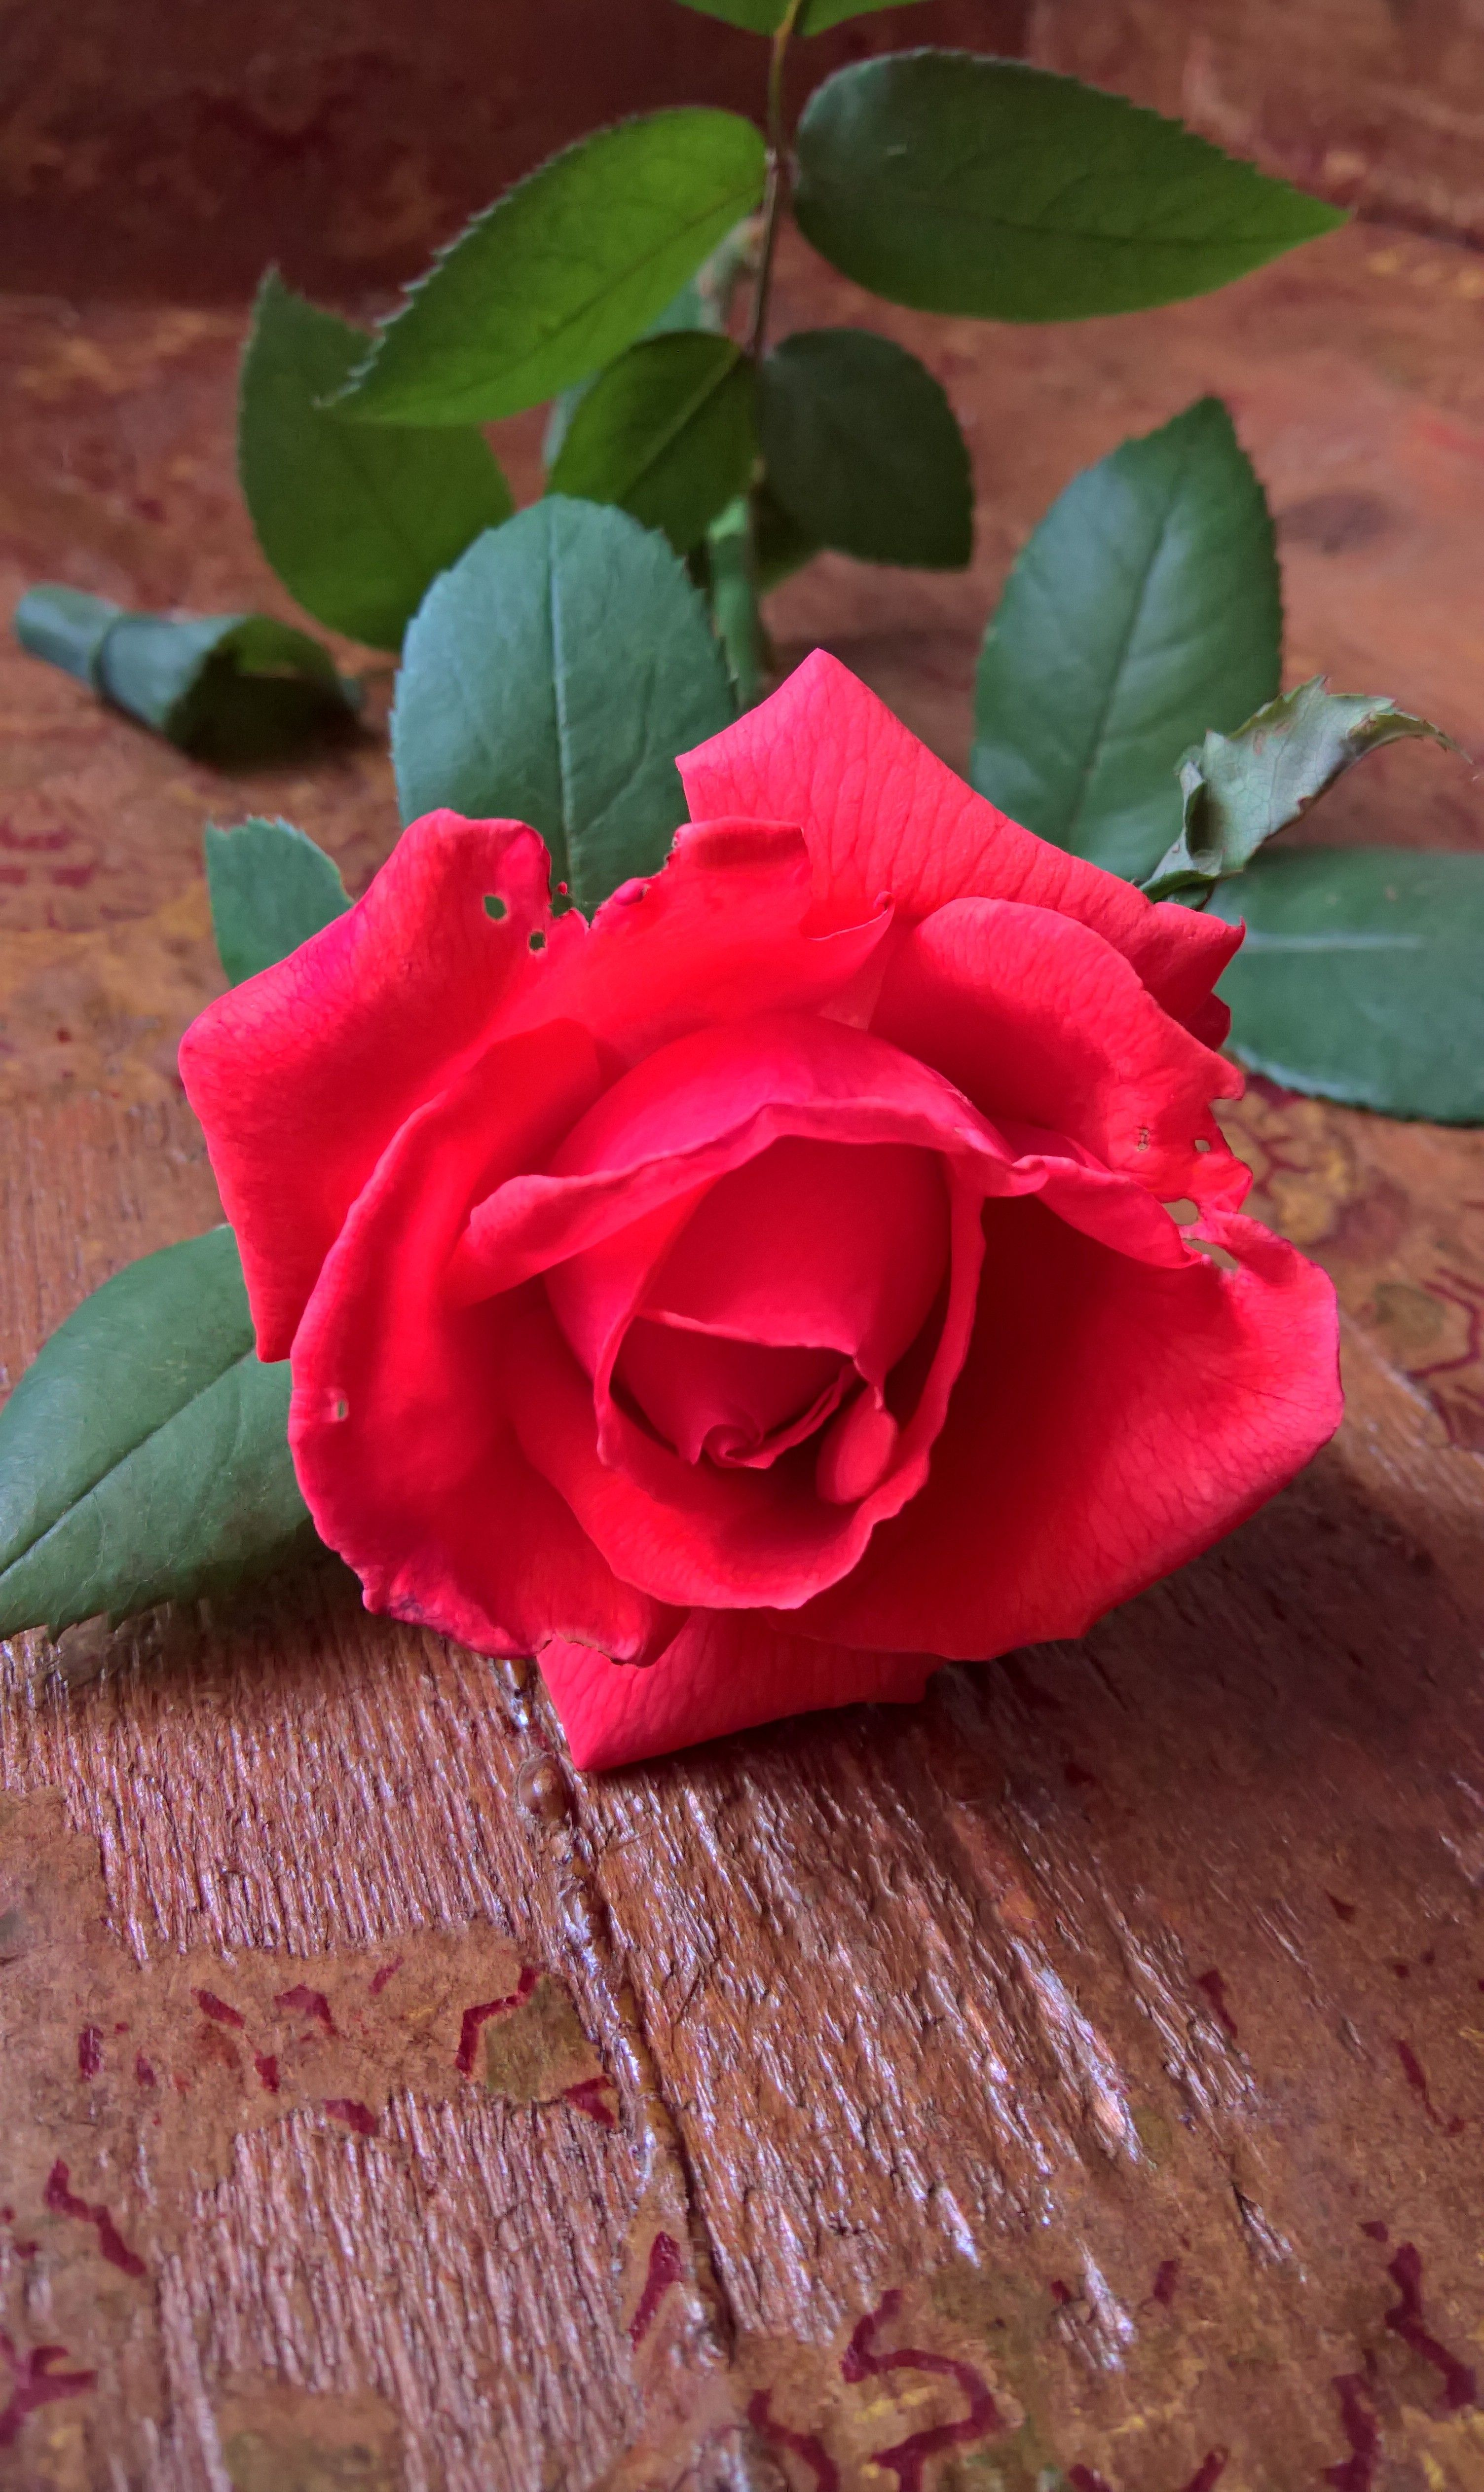 Pin by Migdalia Valentine on rosas | Pinterest | Flowers, Pretty ...